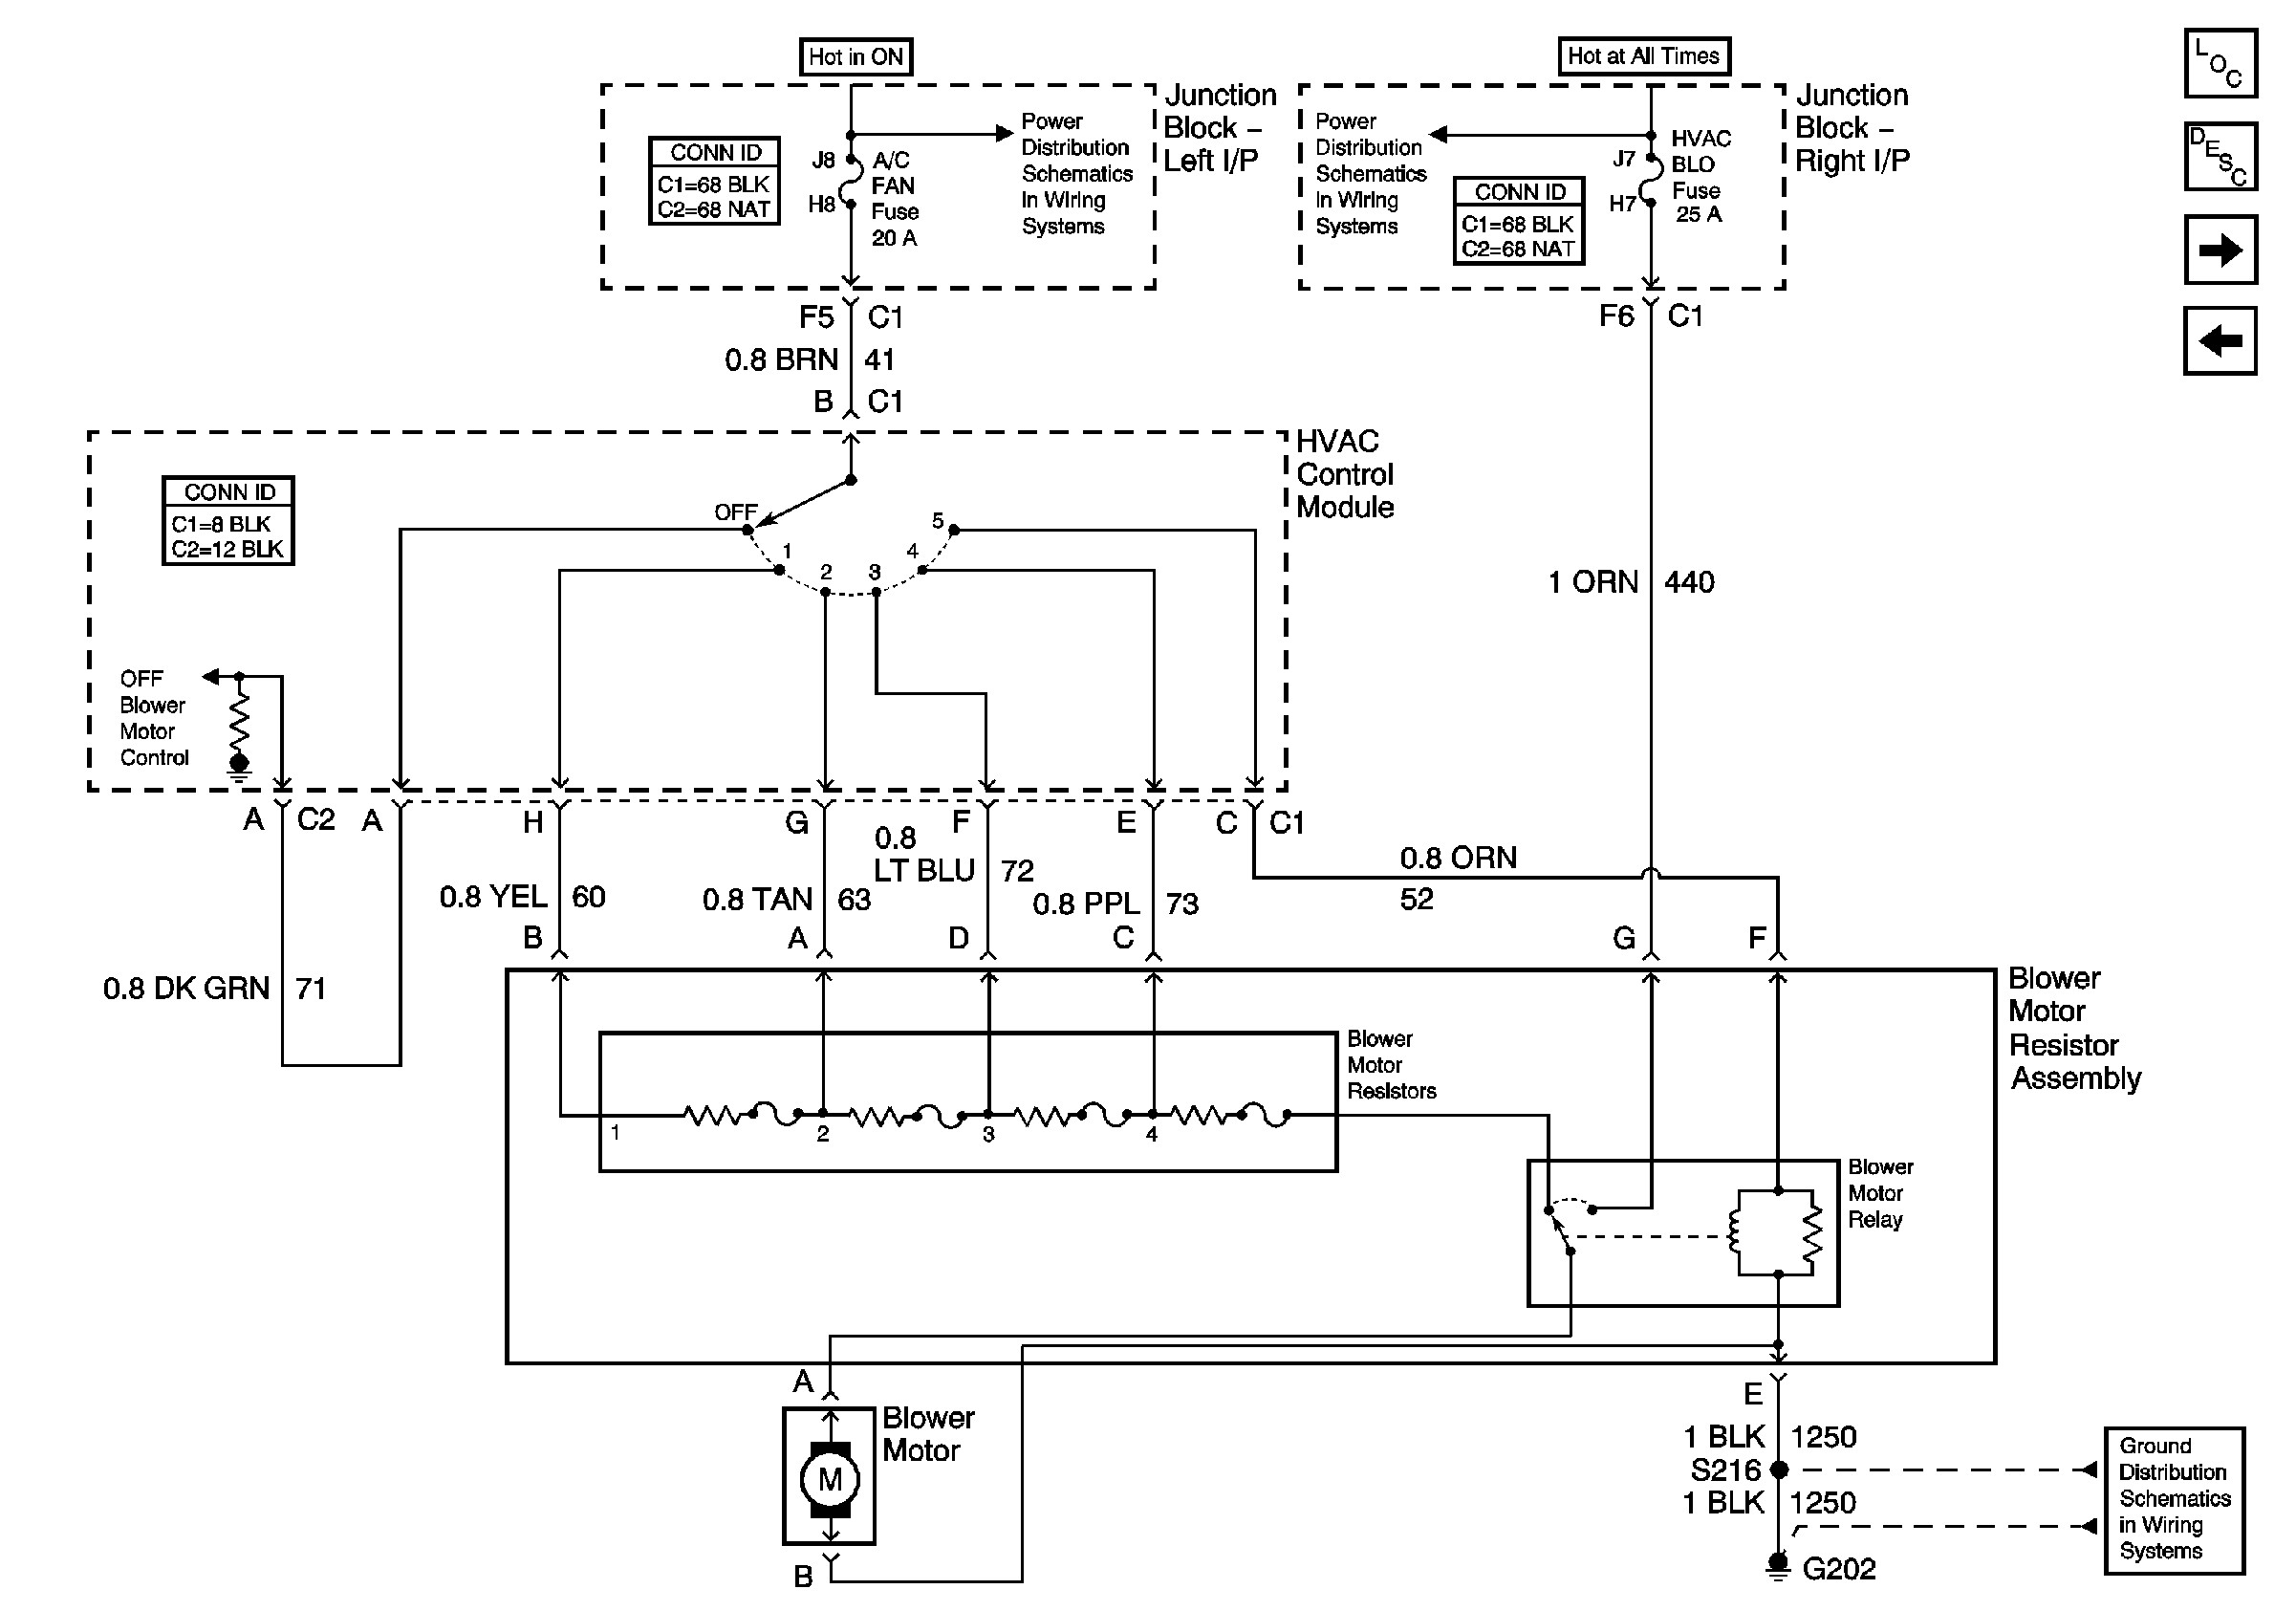 Wiring Diagram 2006 Chevy Silverado from i0.wp.com